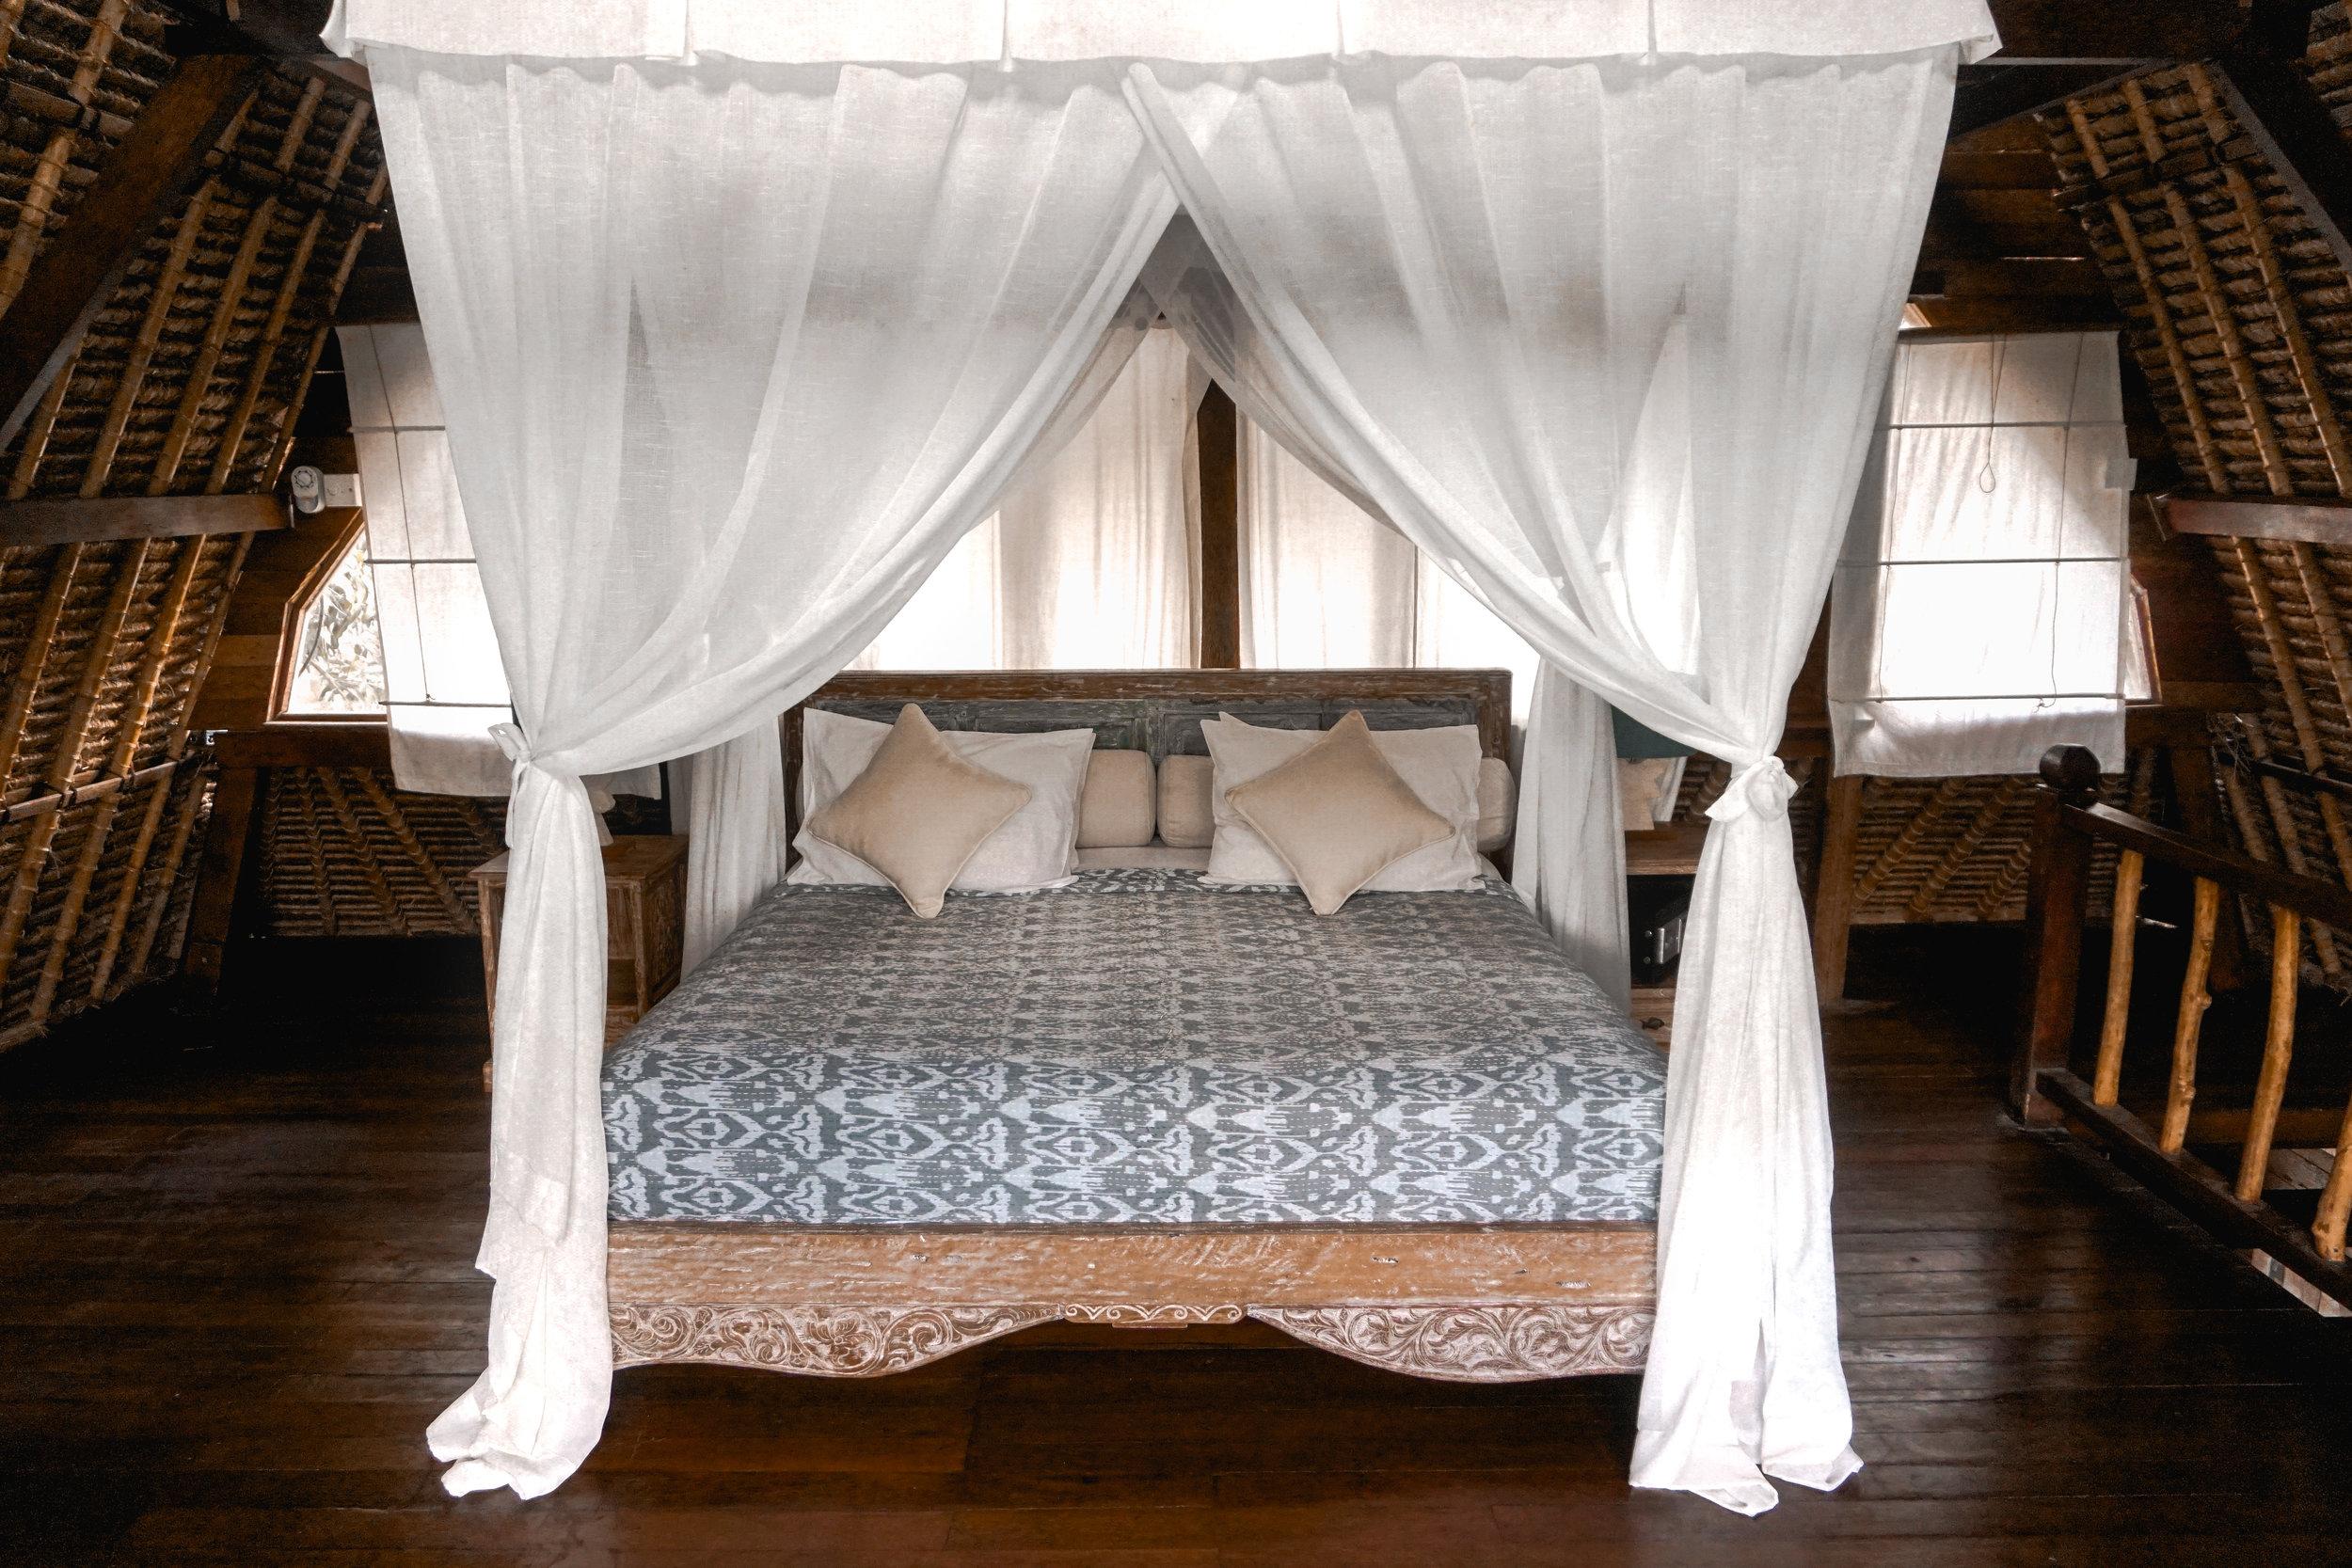 Bali - Balinese wooden hut